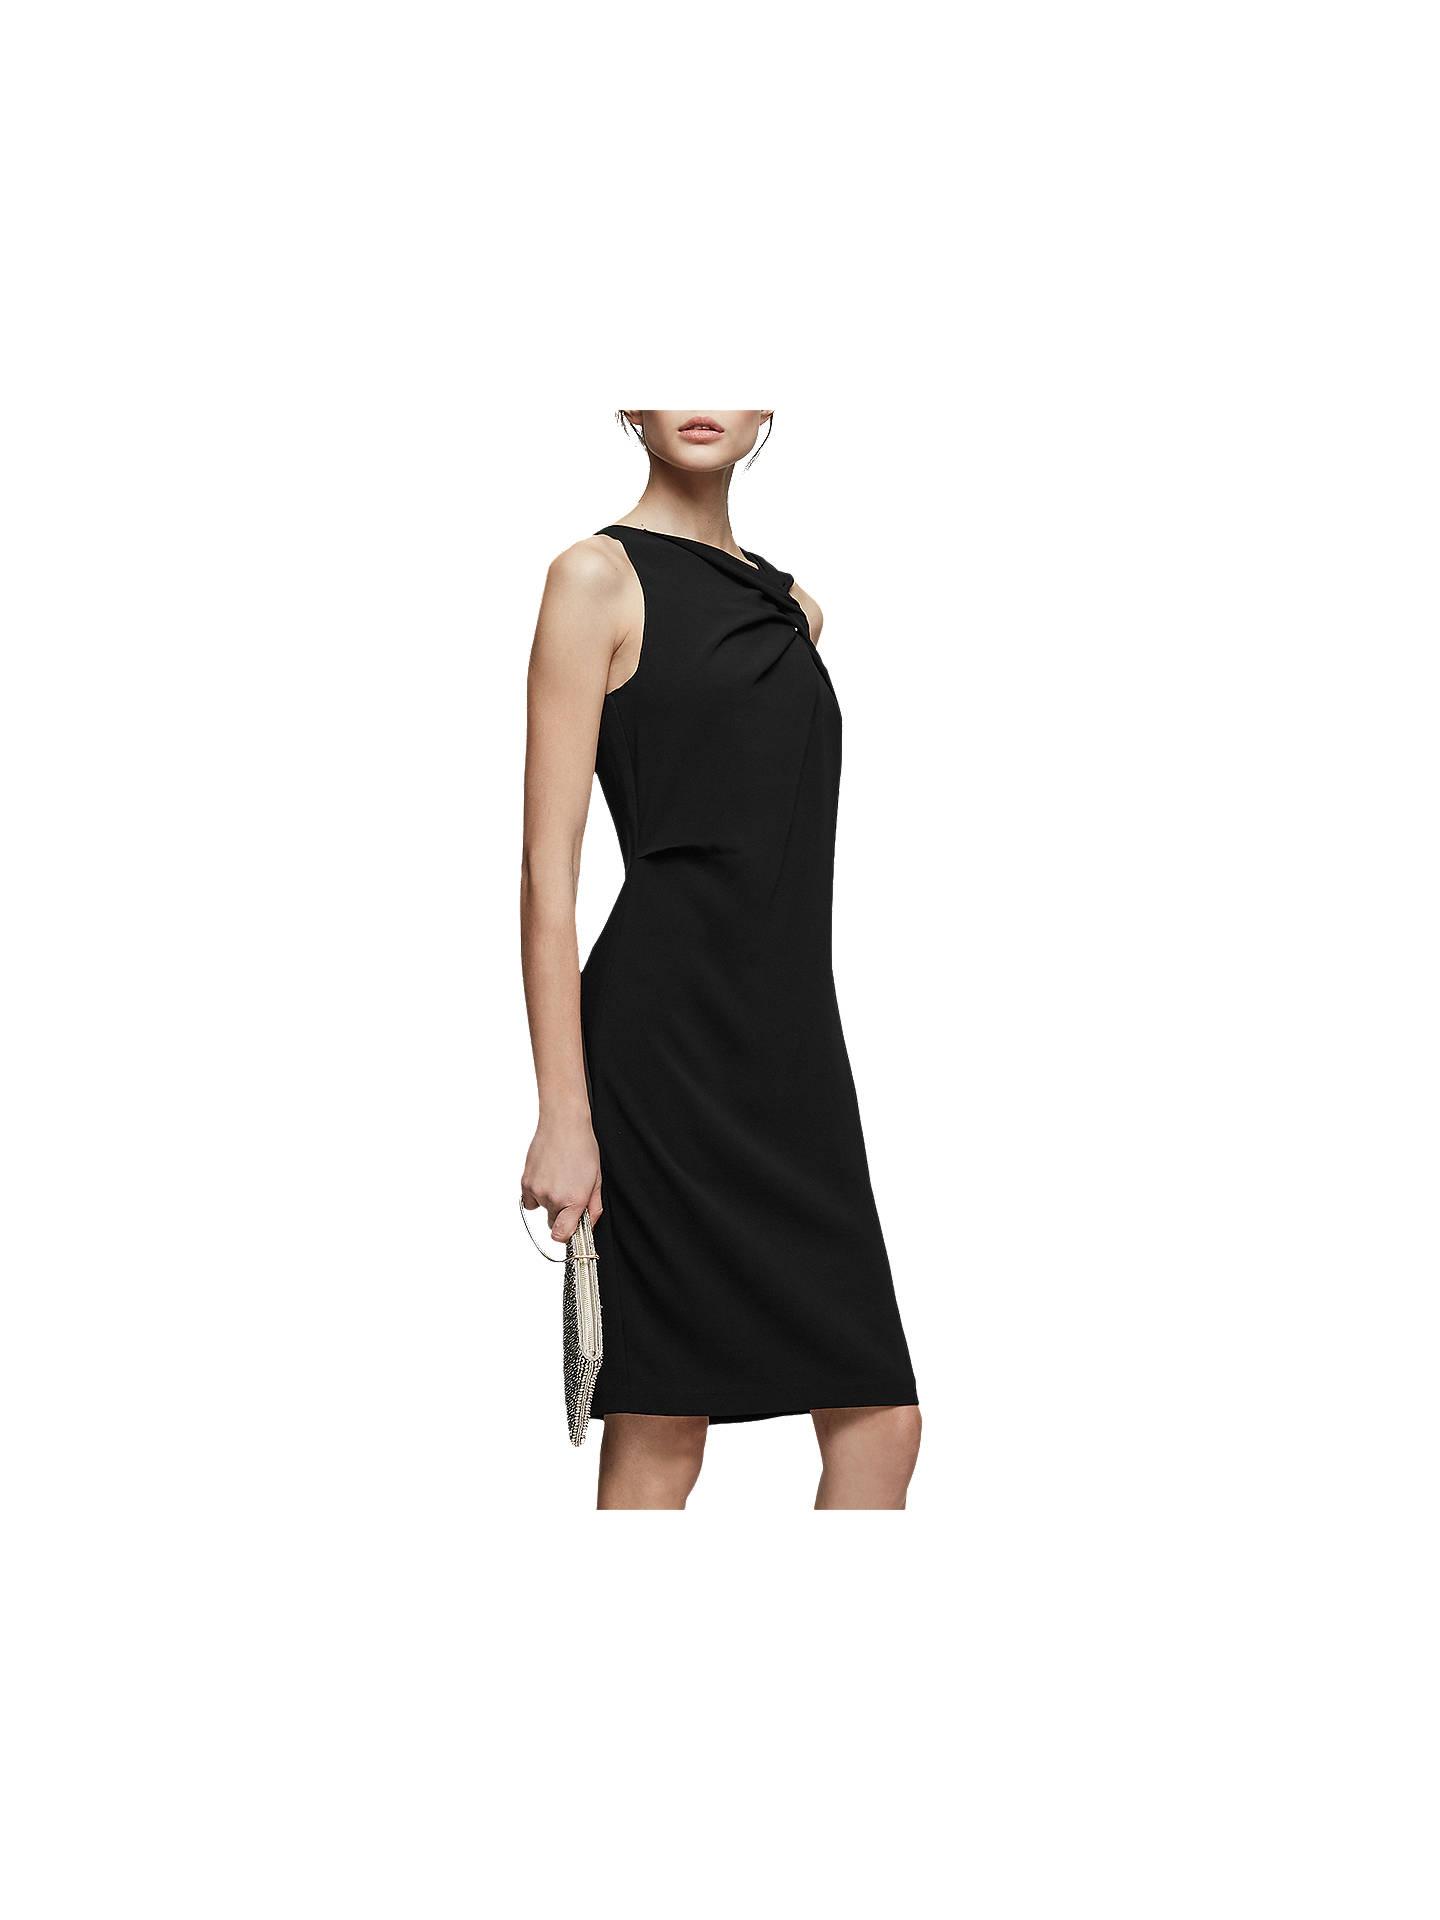 2e521231af5 Buy Reiss Aliya Asymmetrical Neck Dress